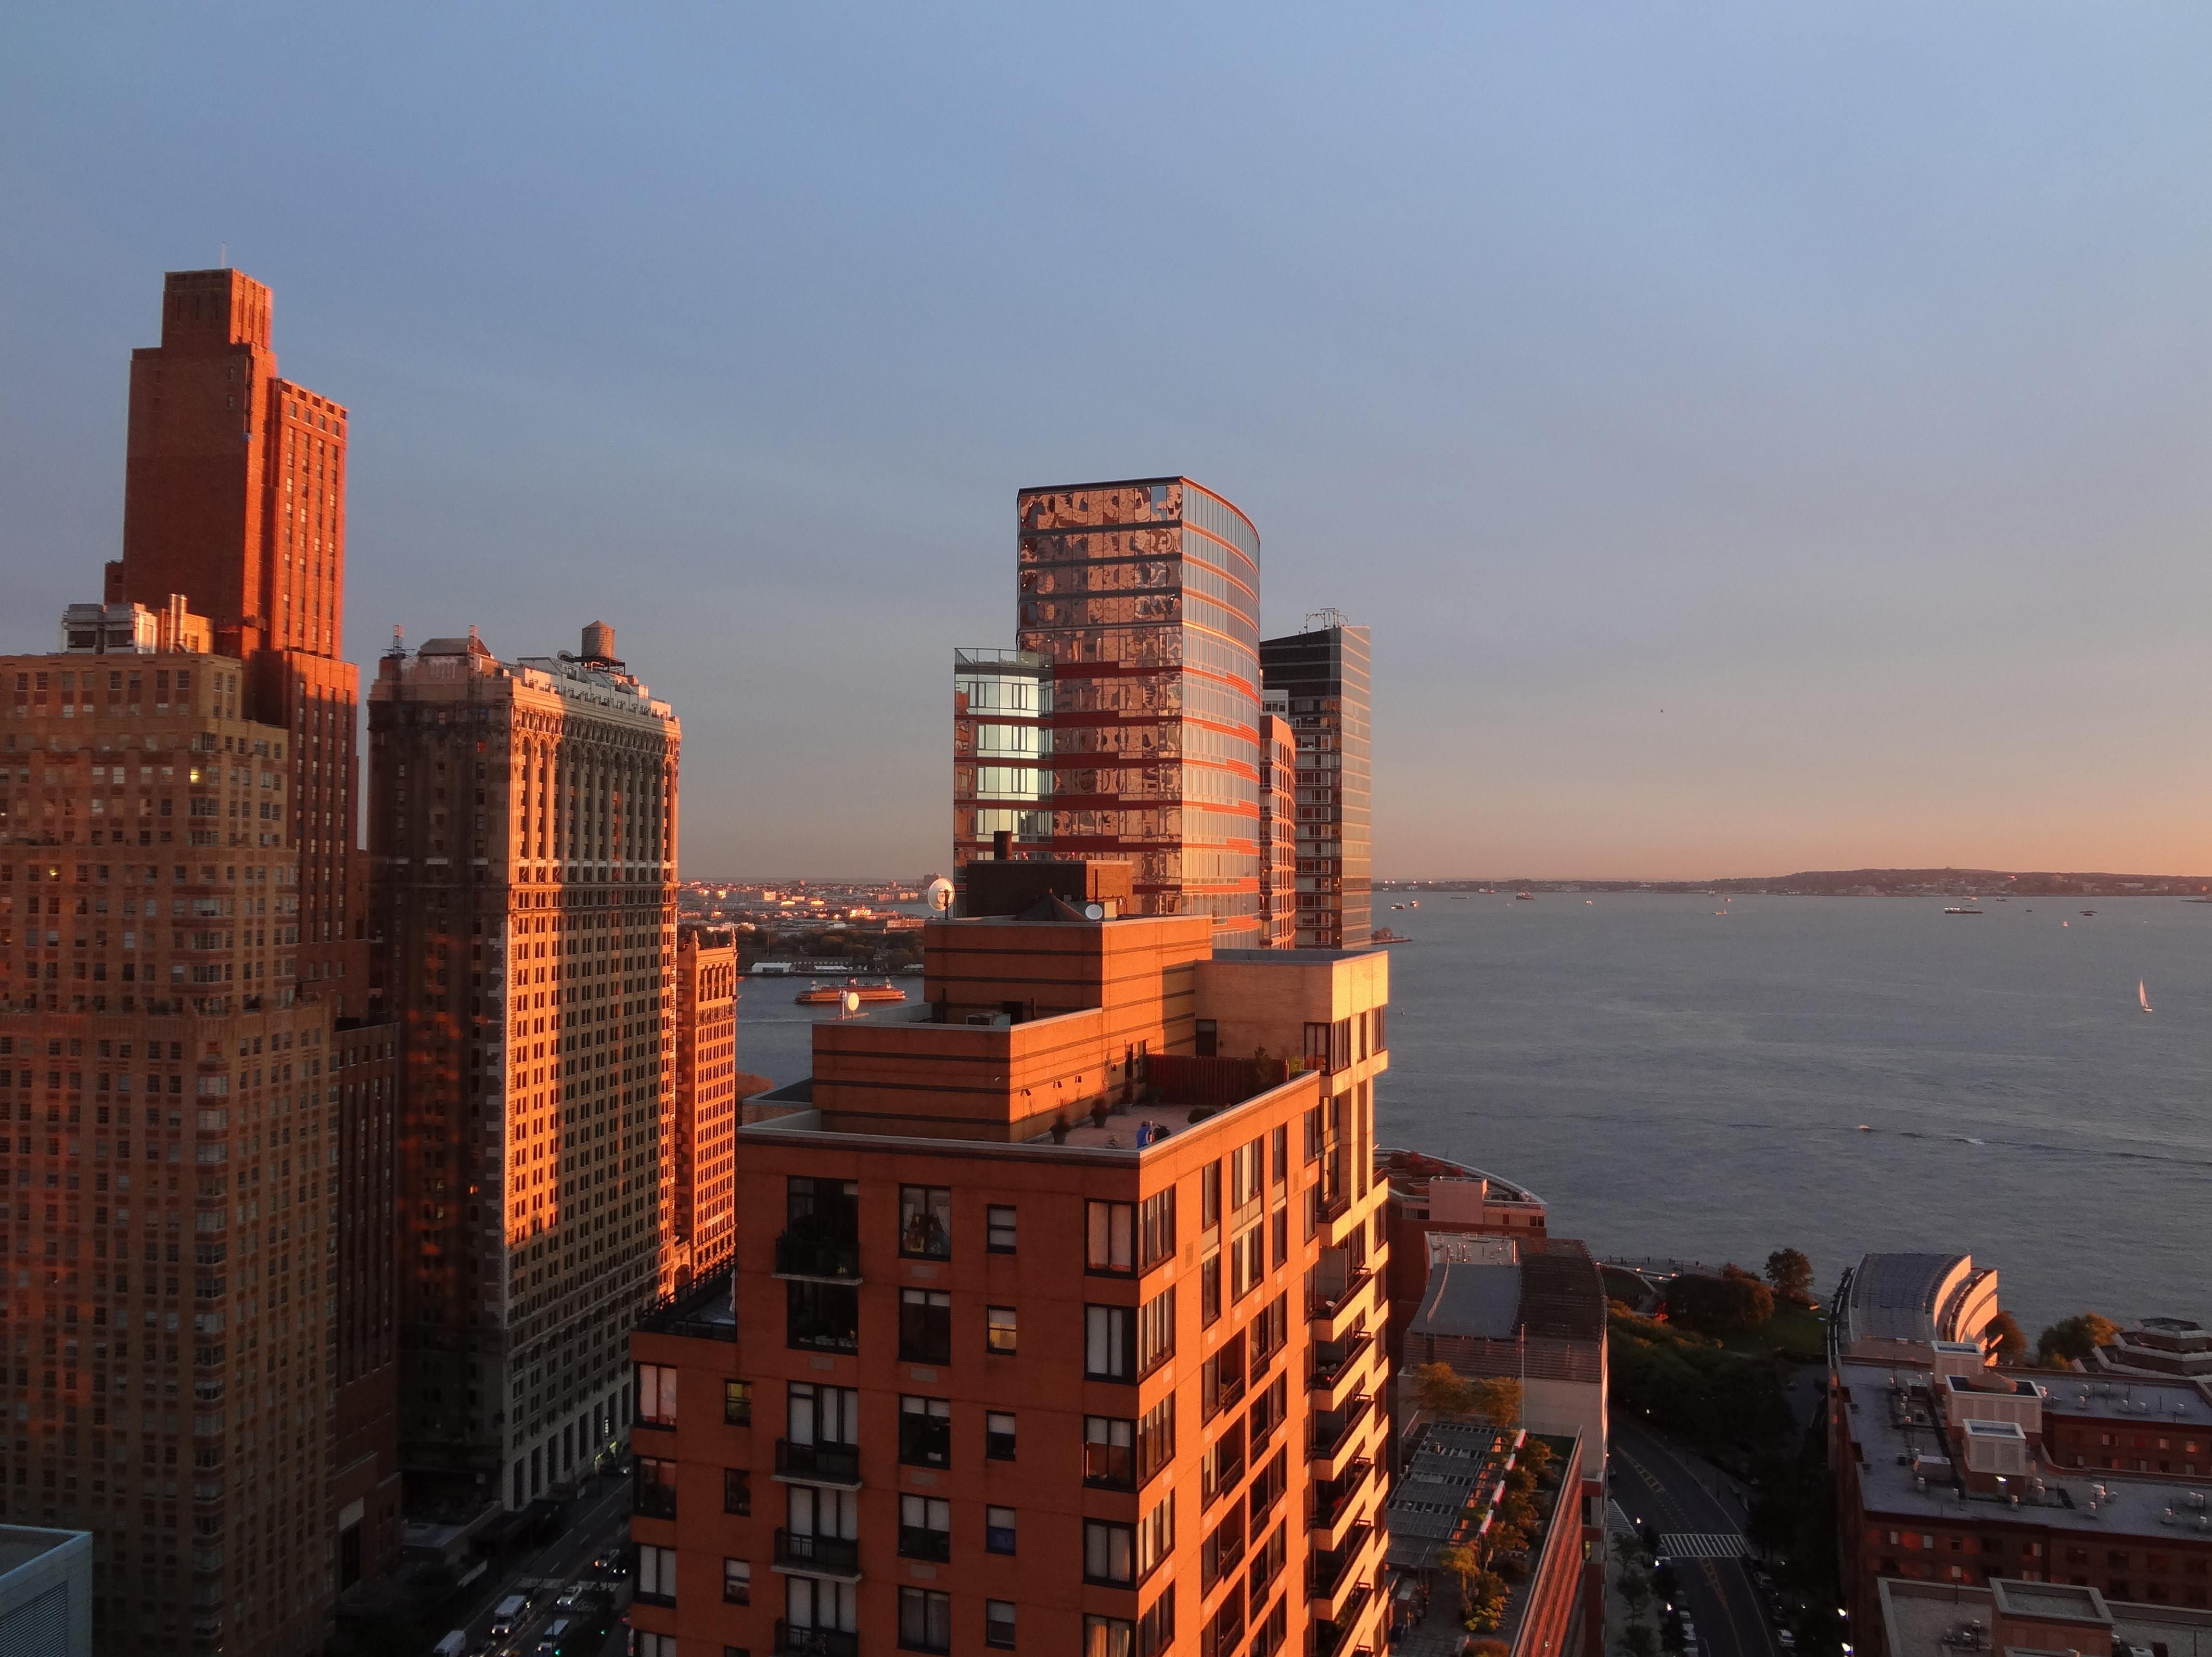 Sunset New York Harbor 10-8-2013